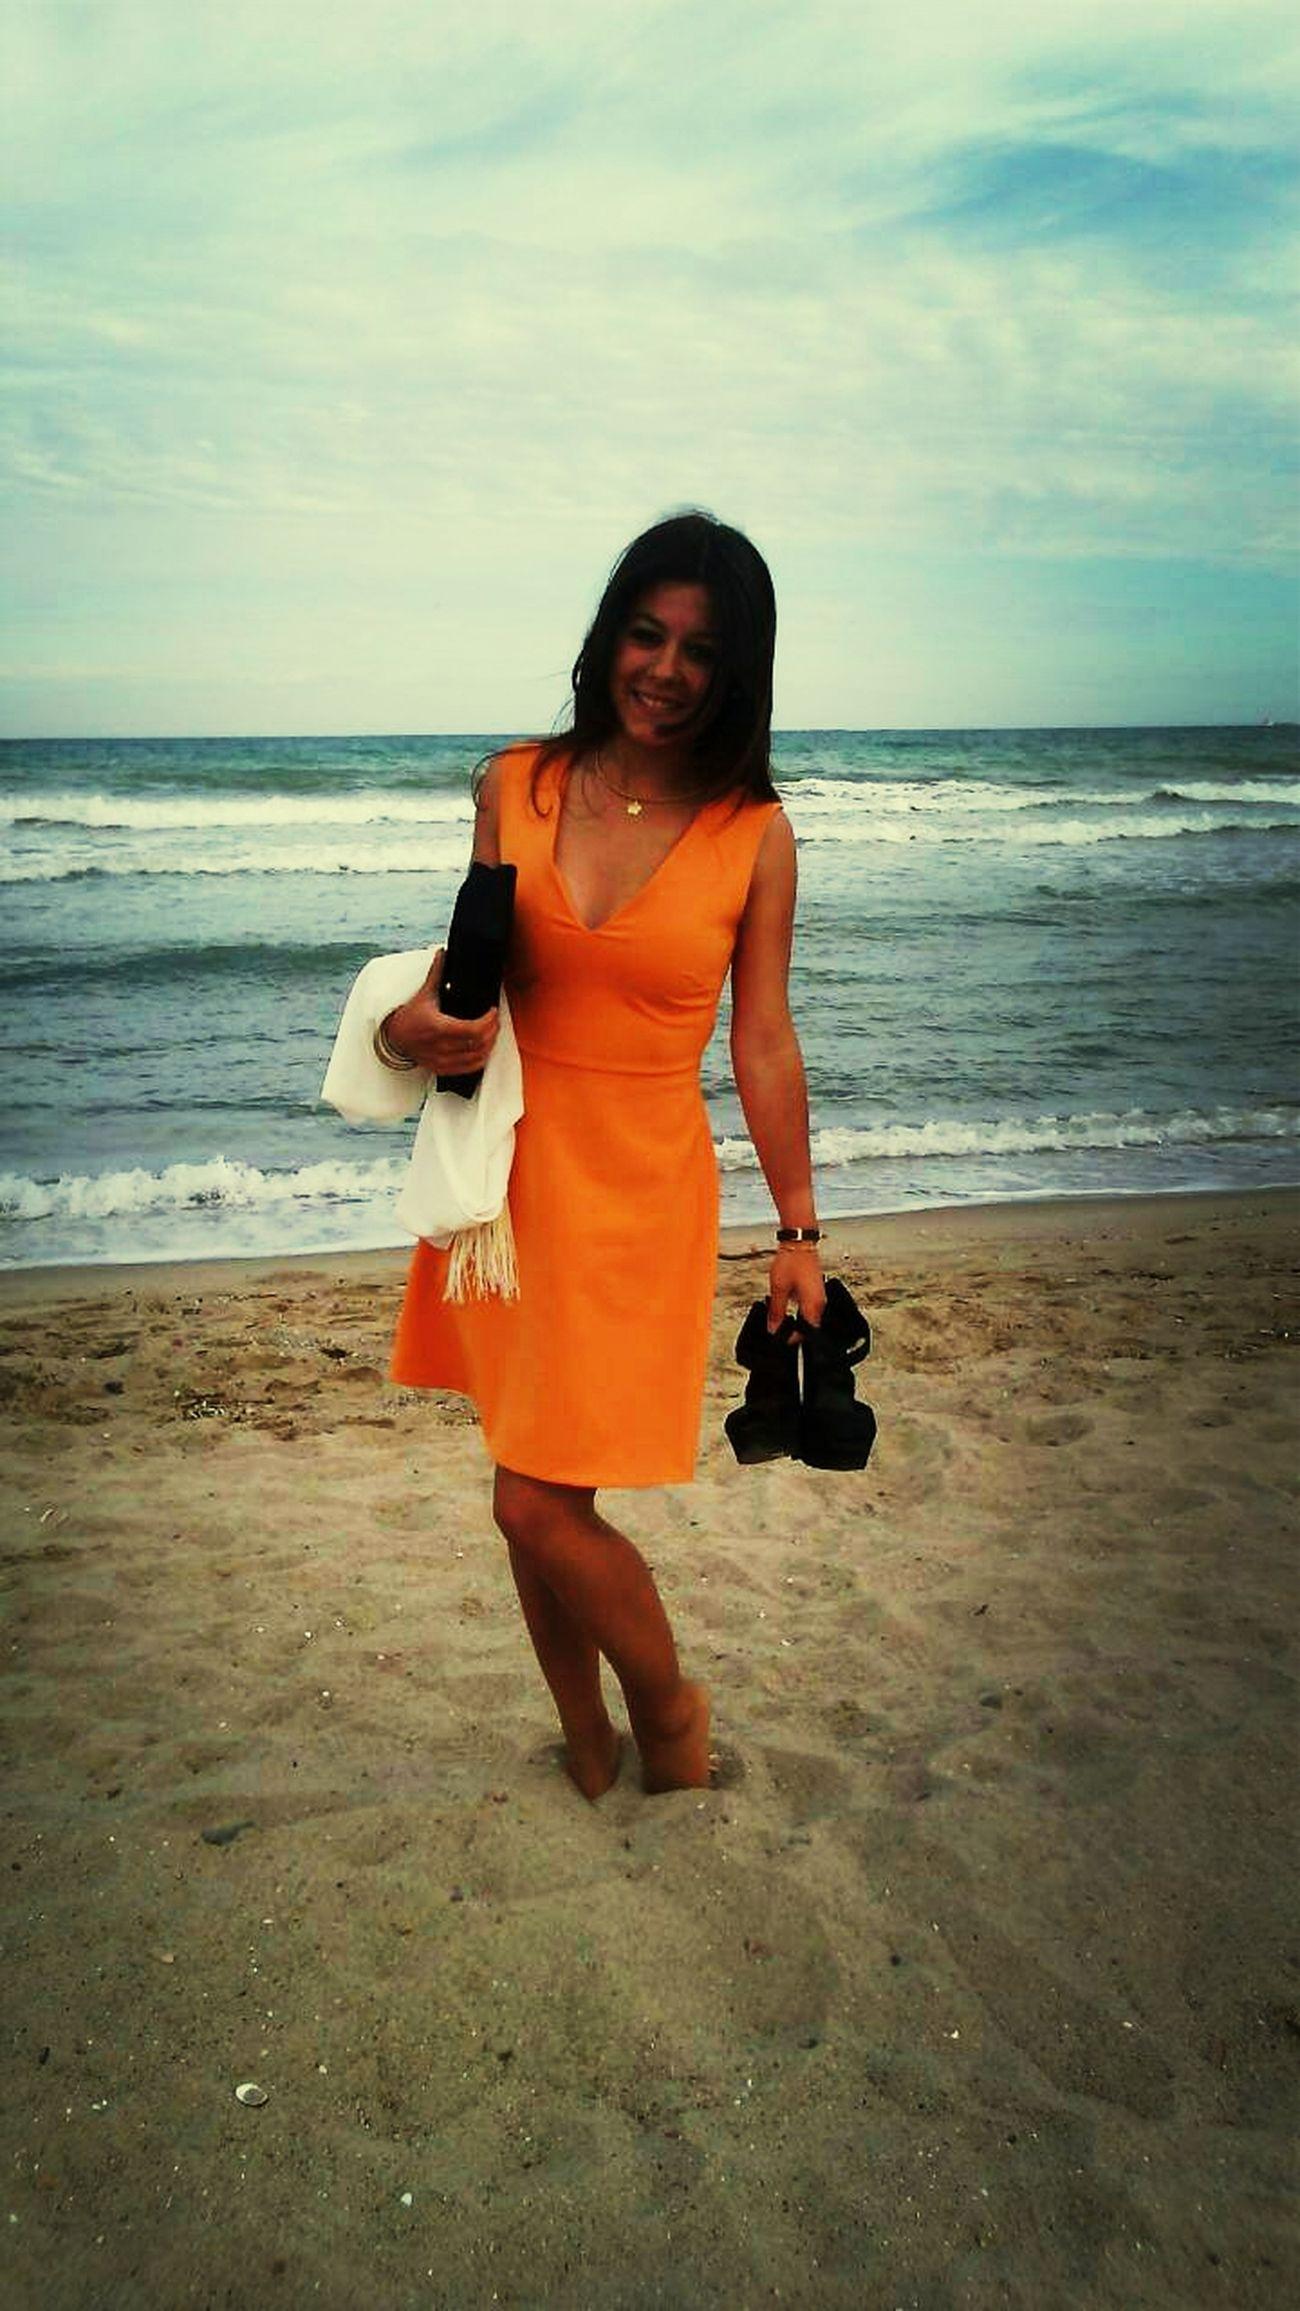 Me Happiness Beach Beachphotography